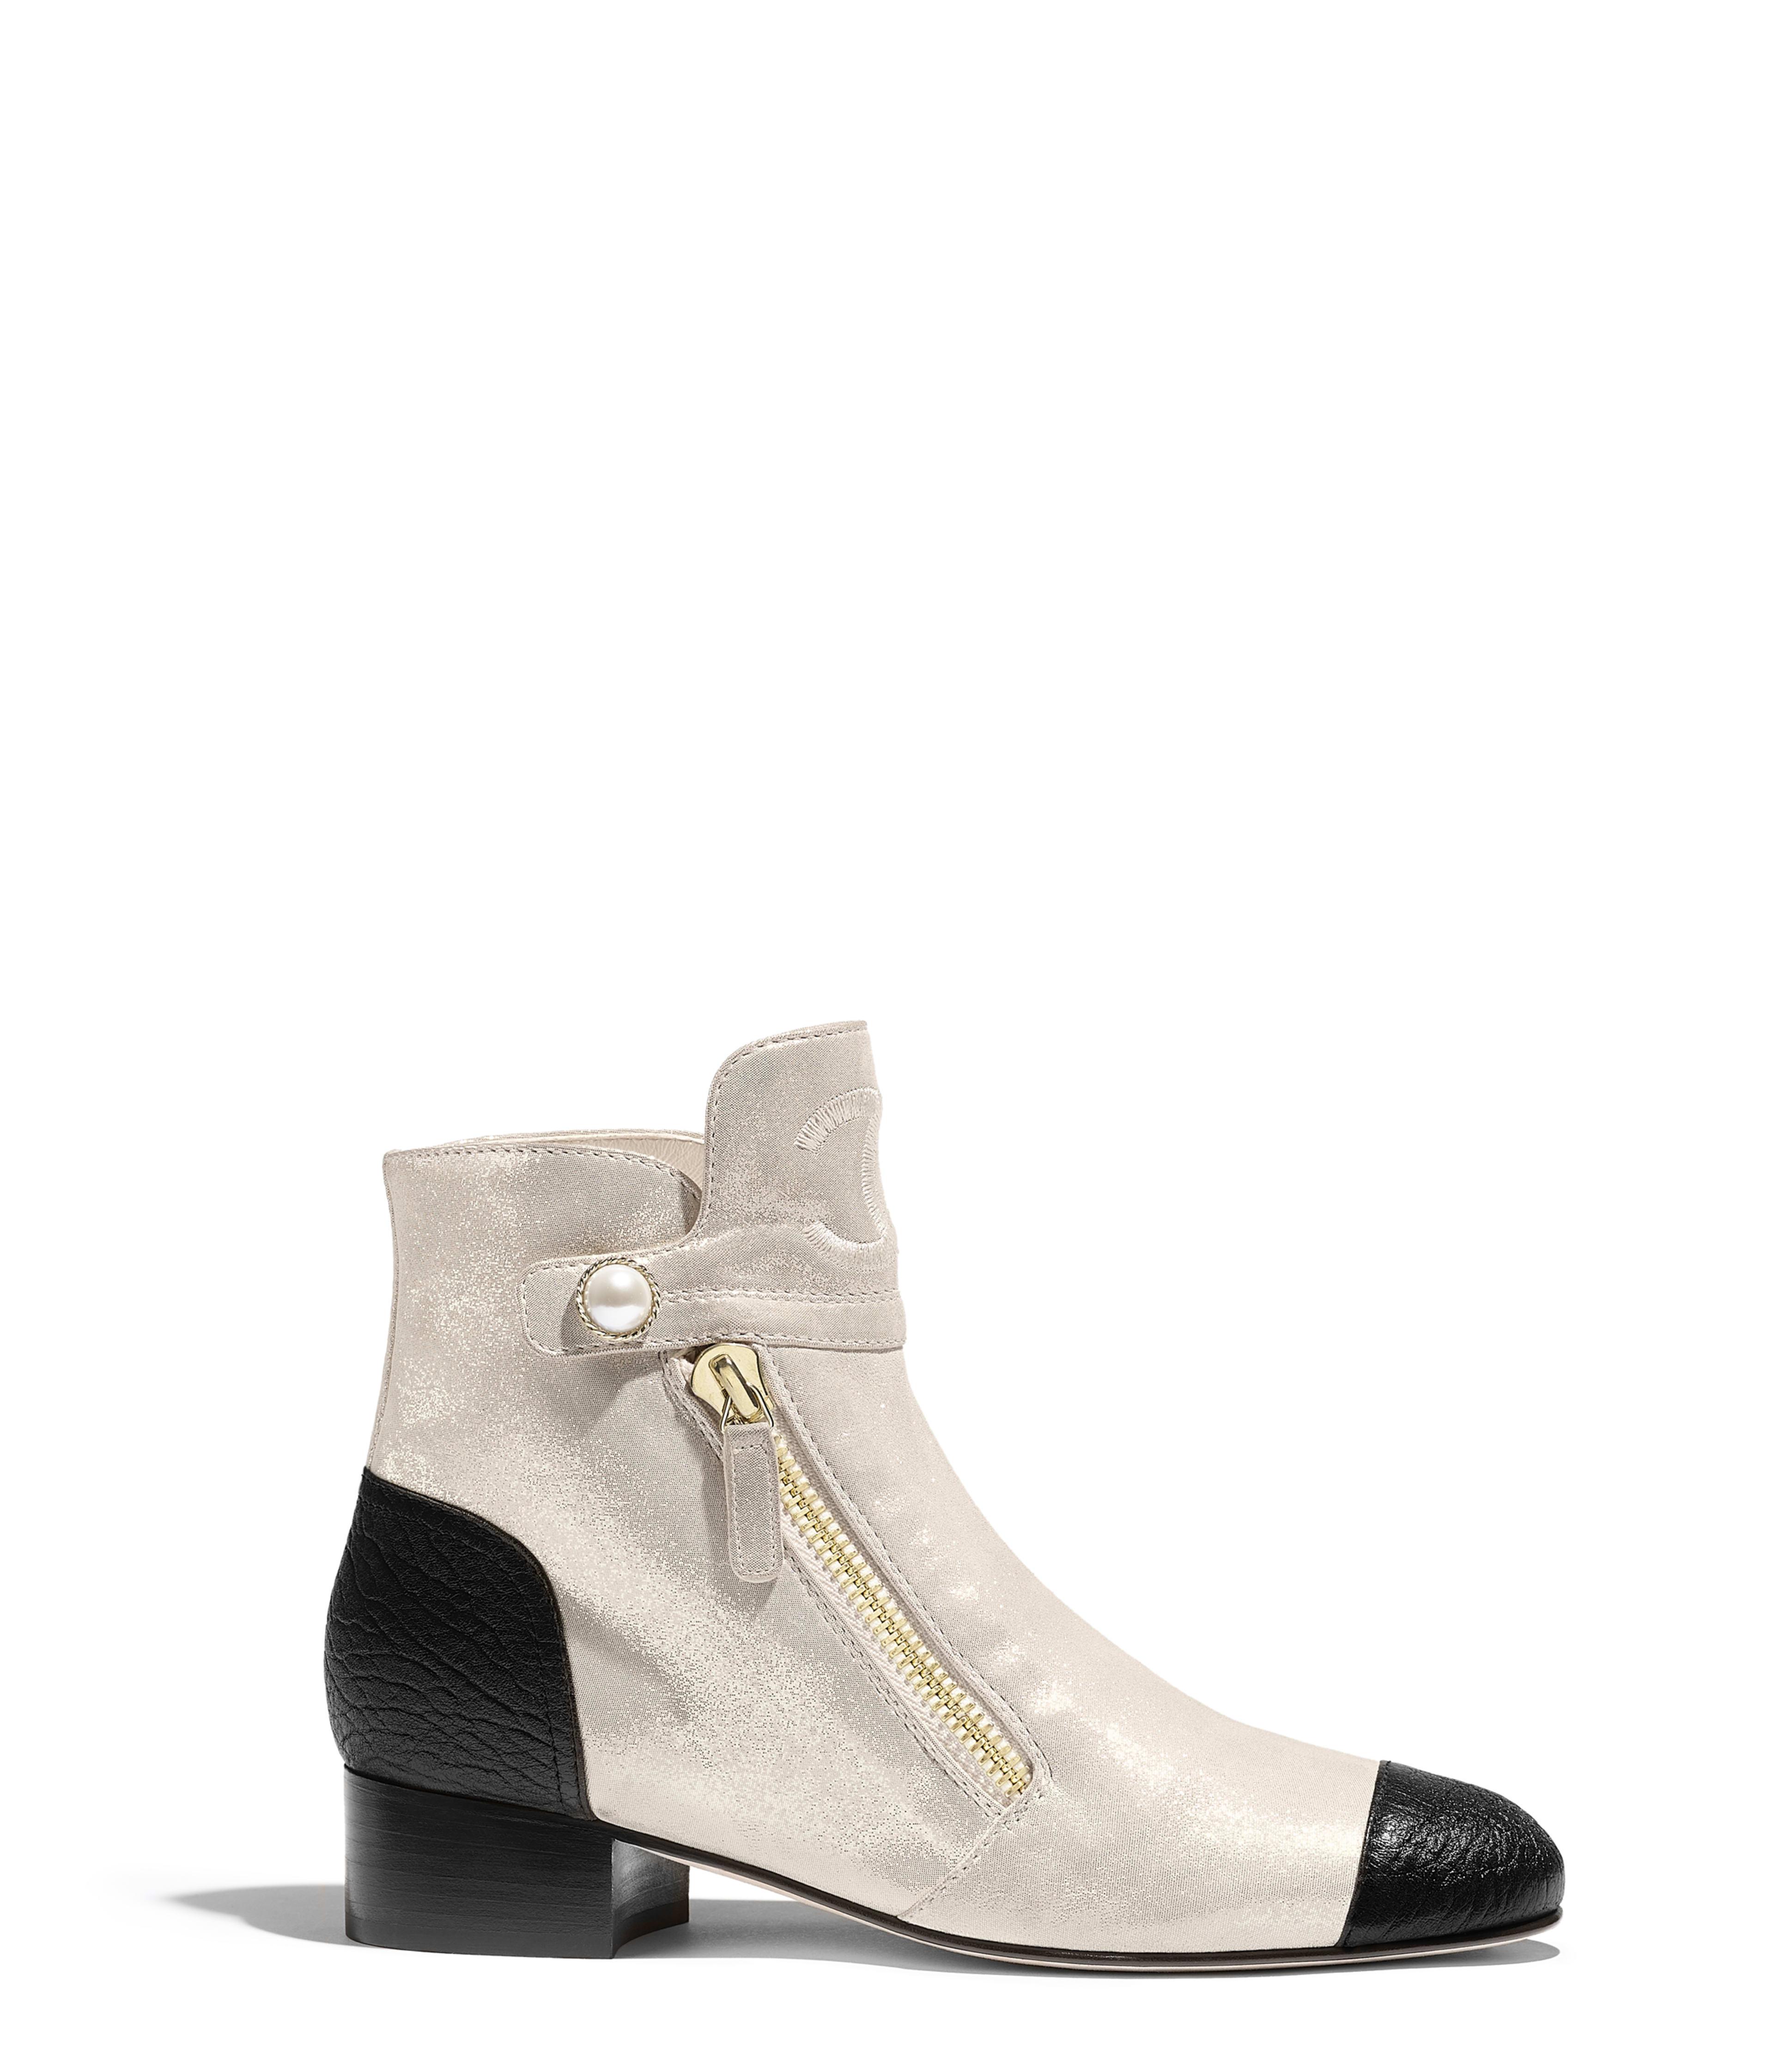 a28c7cfd769e Short Boots Lambskin & Laminated Lambskin, Gold & Black Ref.  G34342Y53123C0369